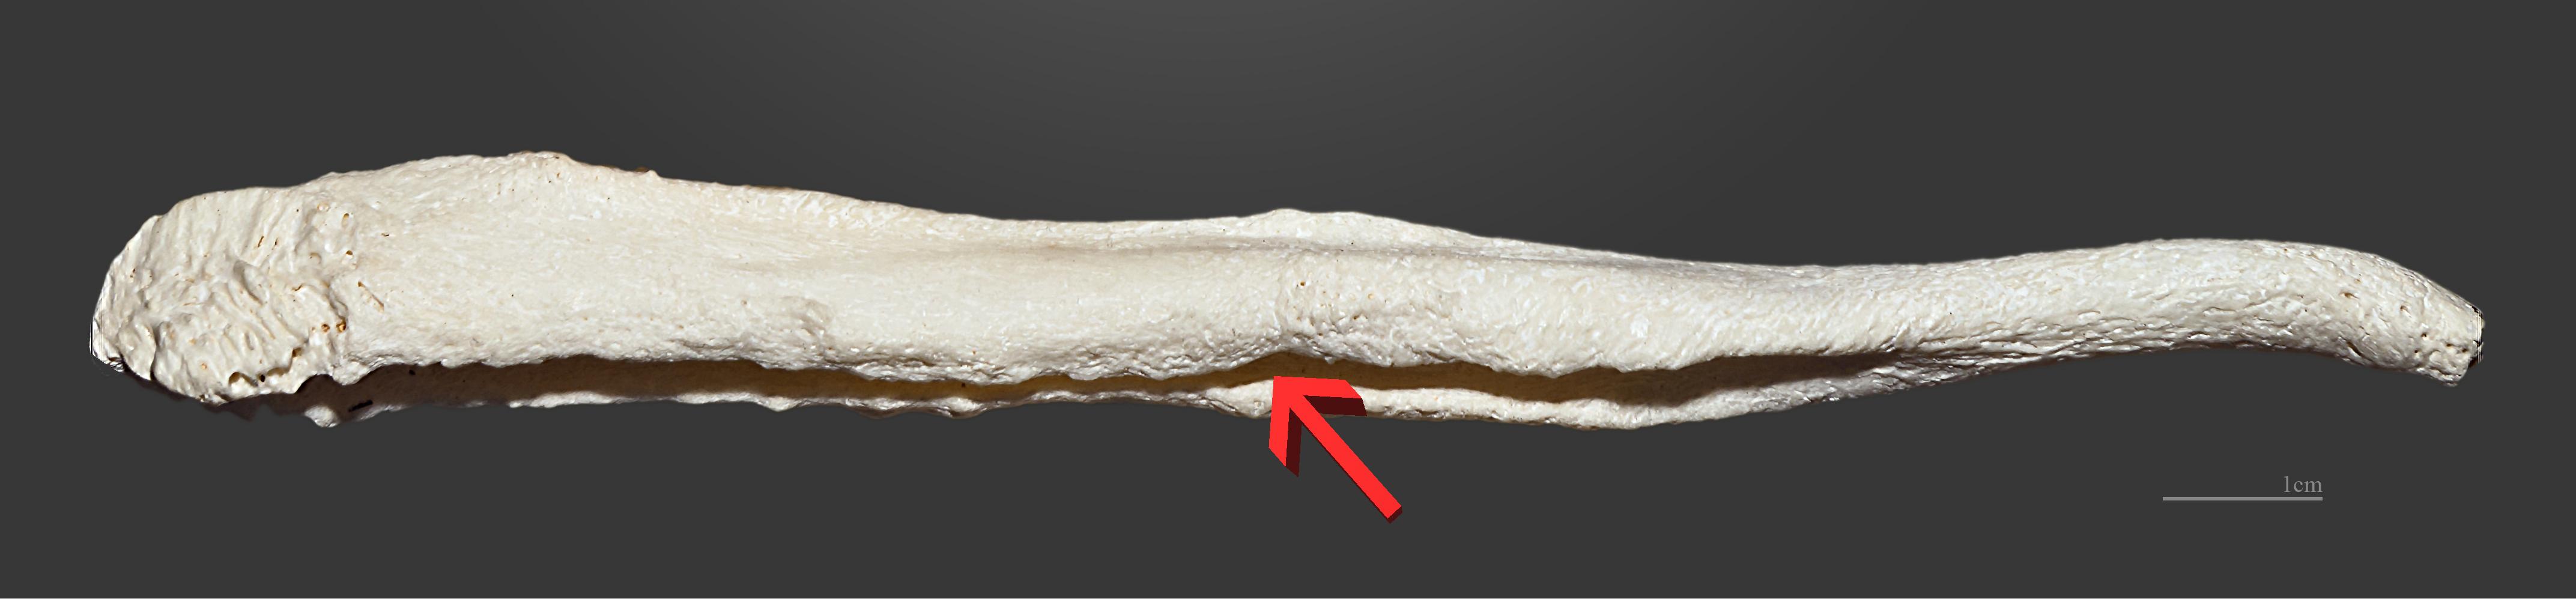 Male dog anatomy bulbus glandis